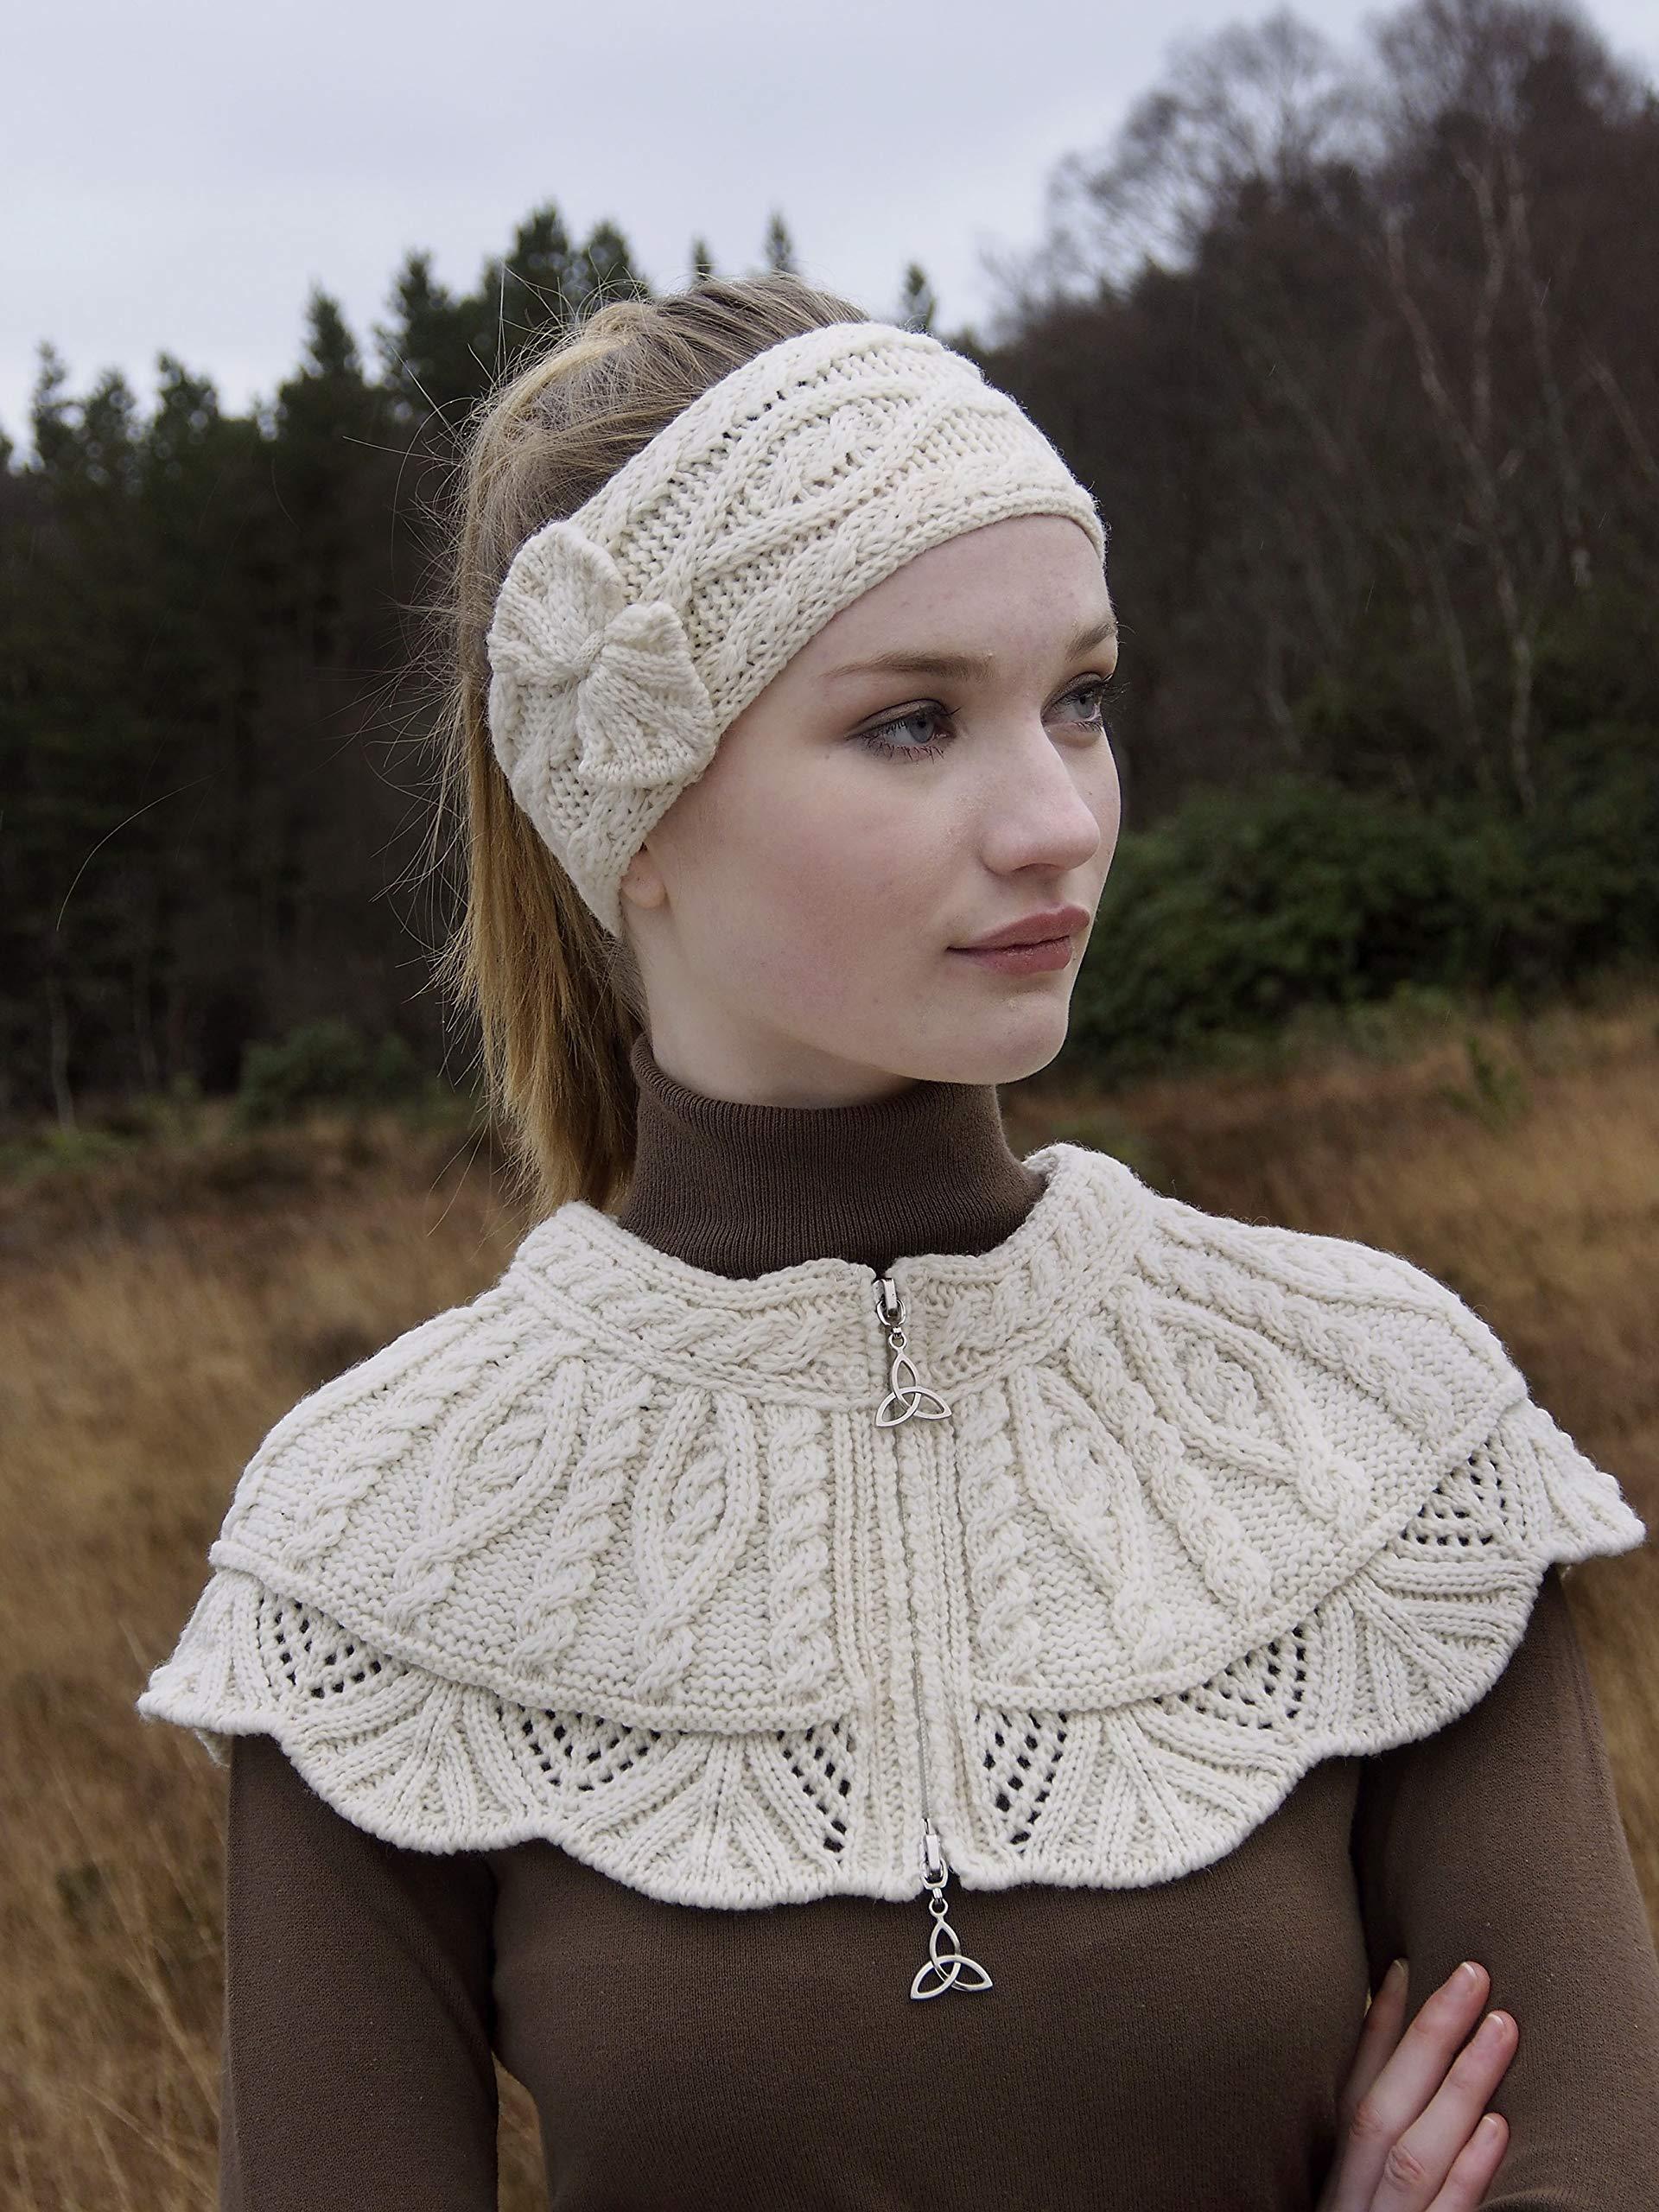 Aran Crafts Headband (100% Merino Wool) One Size Natural (X4341-NAT) by Aran Crafts Ireland (Image #2)